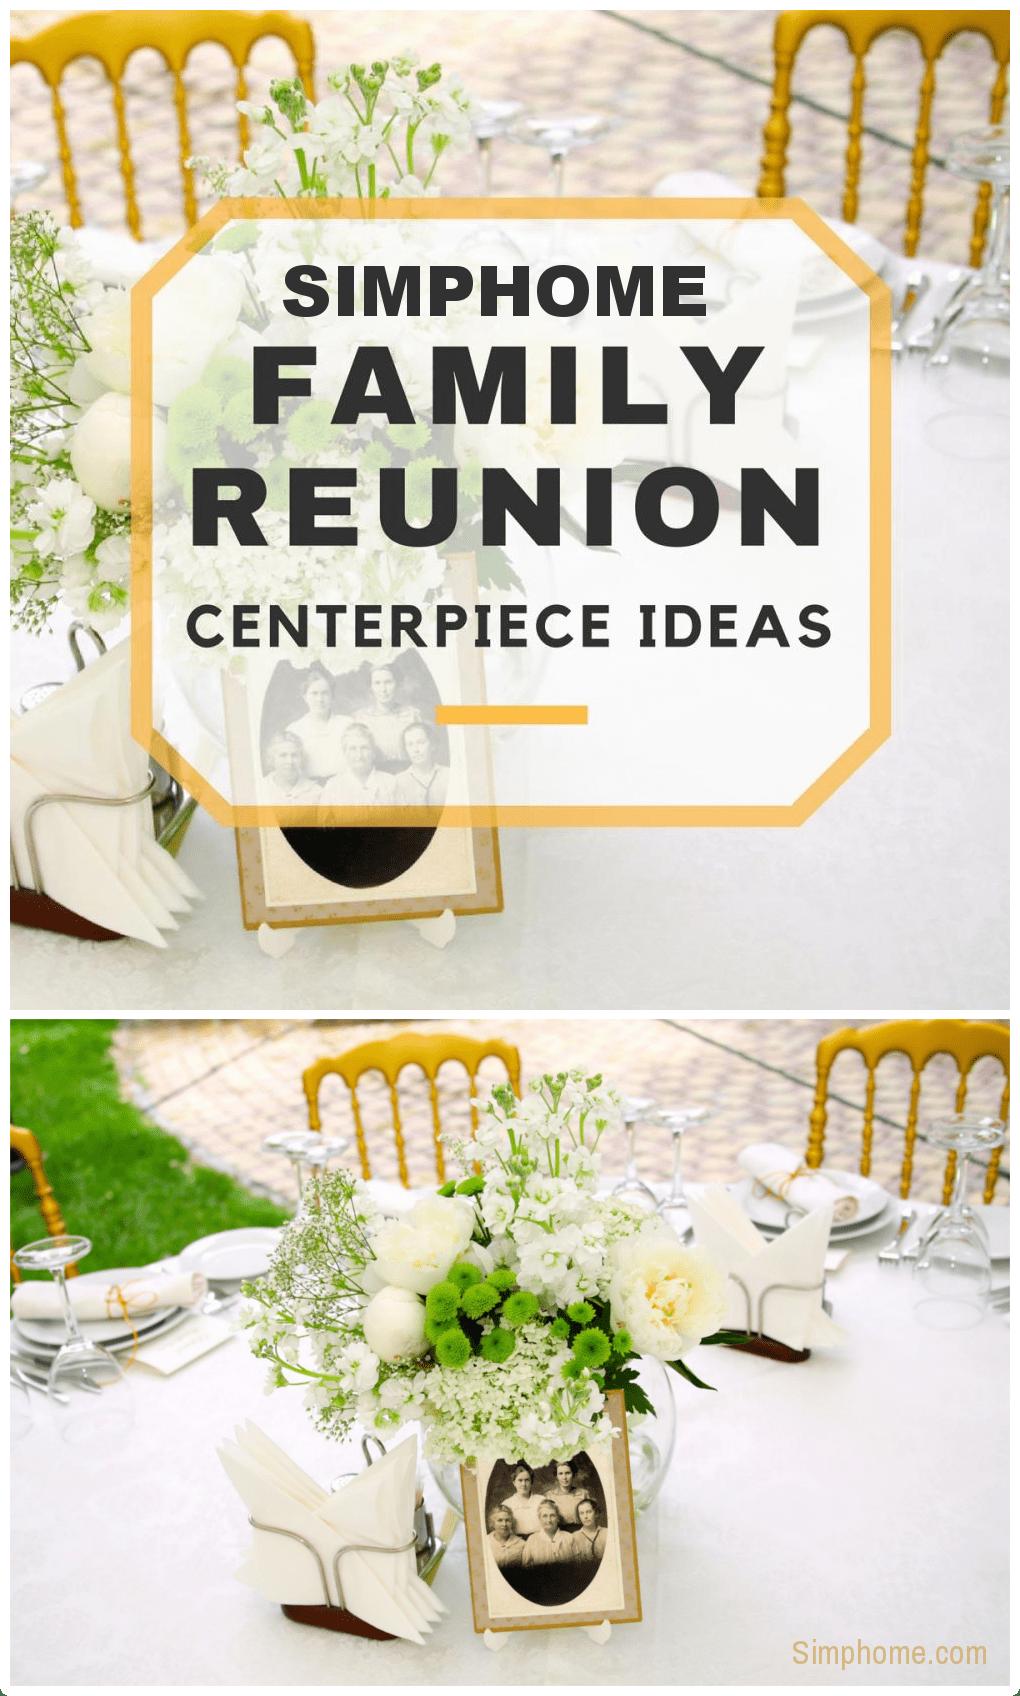 Simphome.com family reunion centerpieces table decorations for 2020 2021 2022